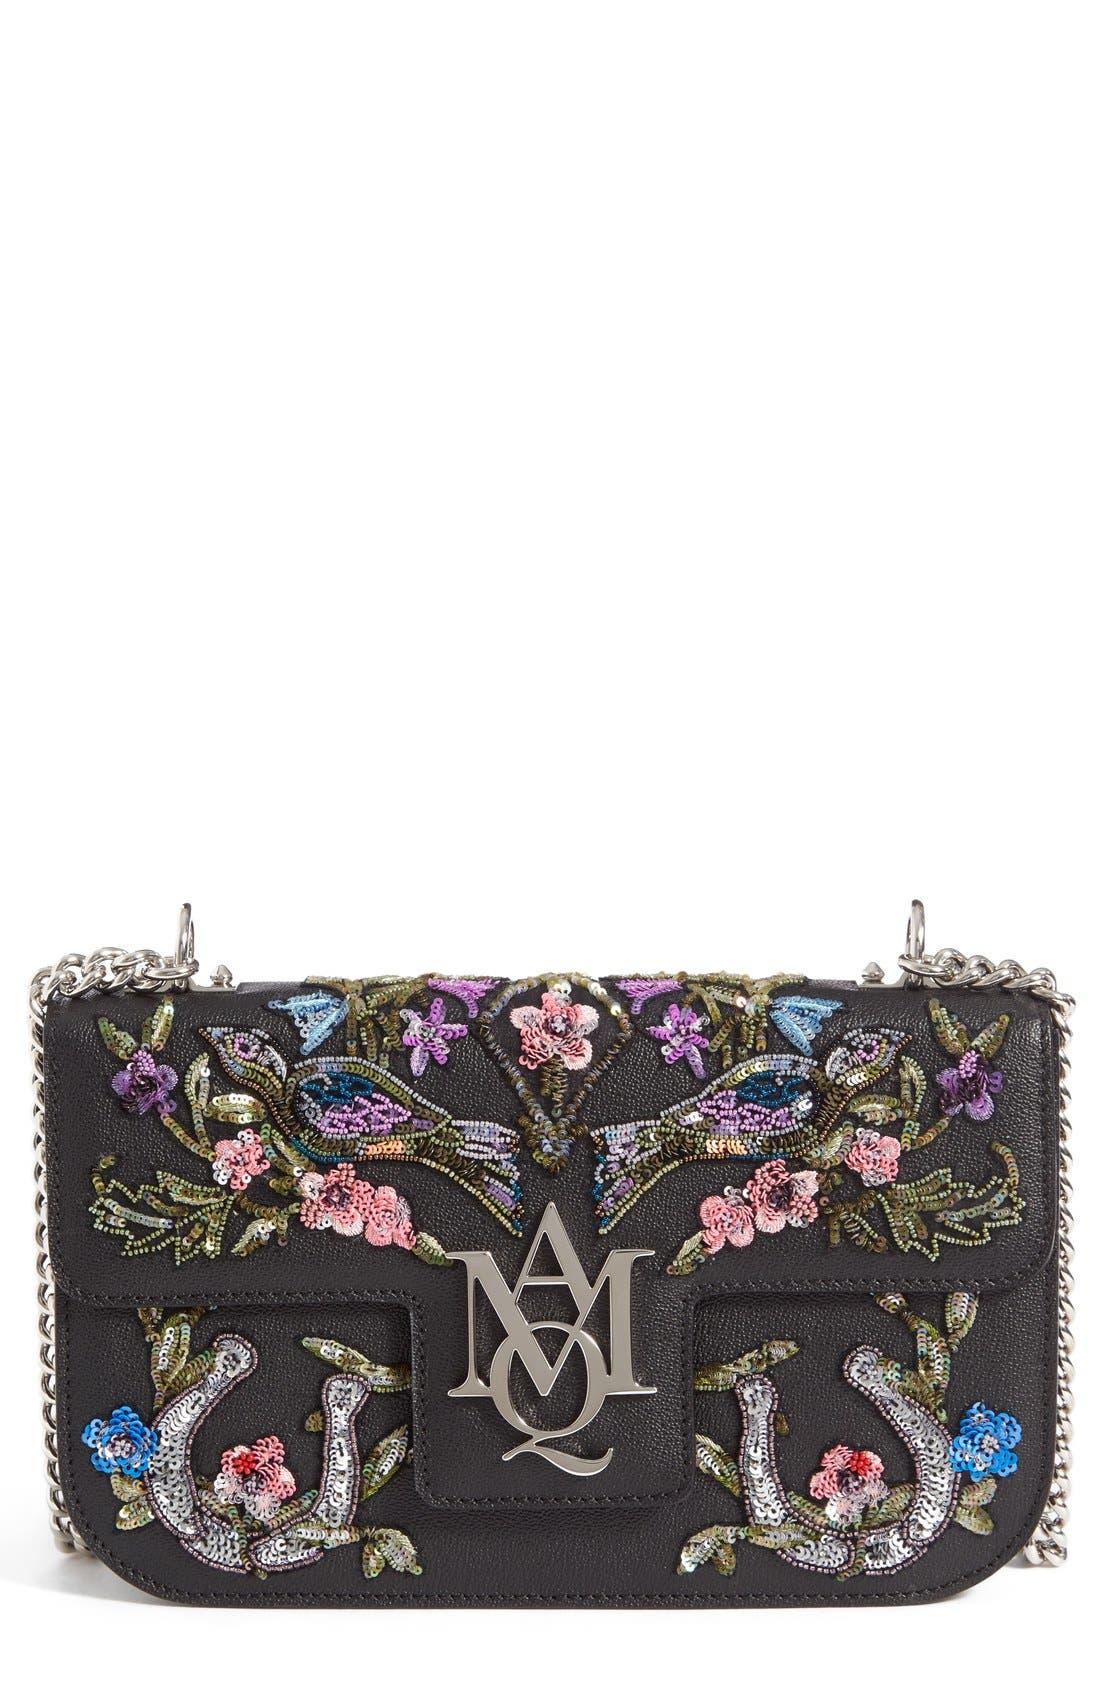 Alternate Image 1 Selected - Alexander McQueen Medium Insignia Calfskin Leather Shoulder Bag